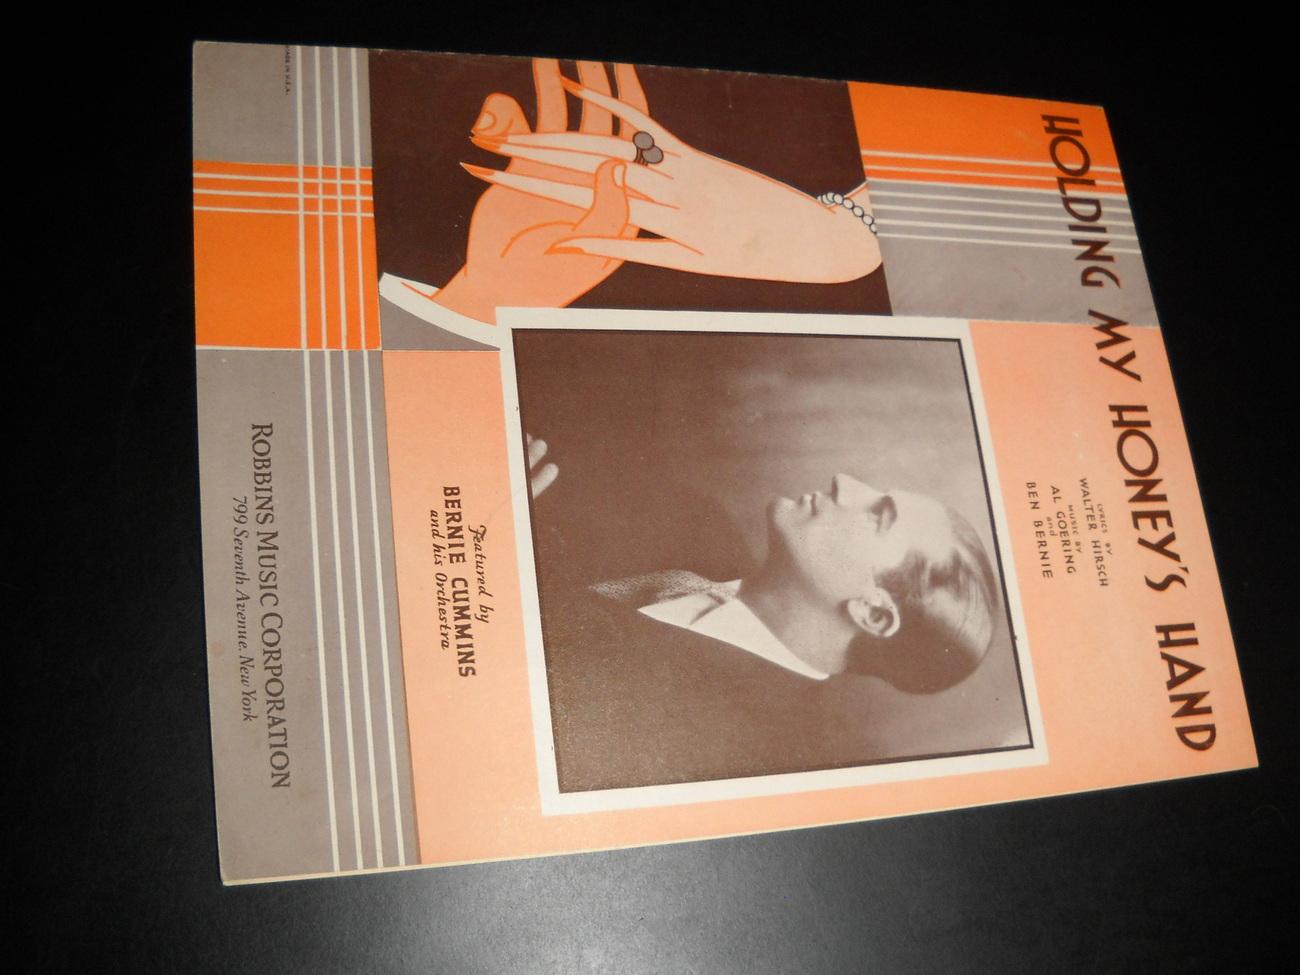 Sheet_music_holding_my_honey_s_hand_bernie_cummins_1932_mgm_robbins_01